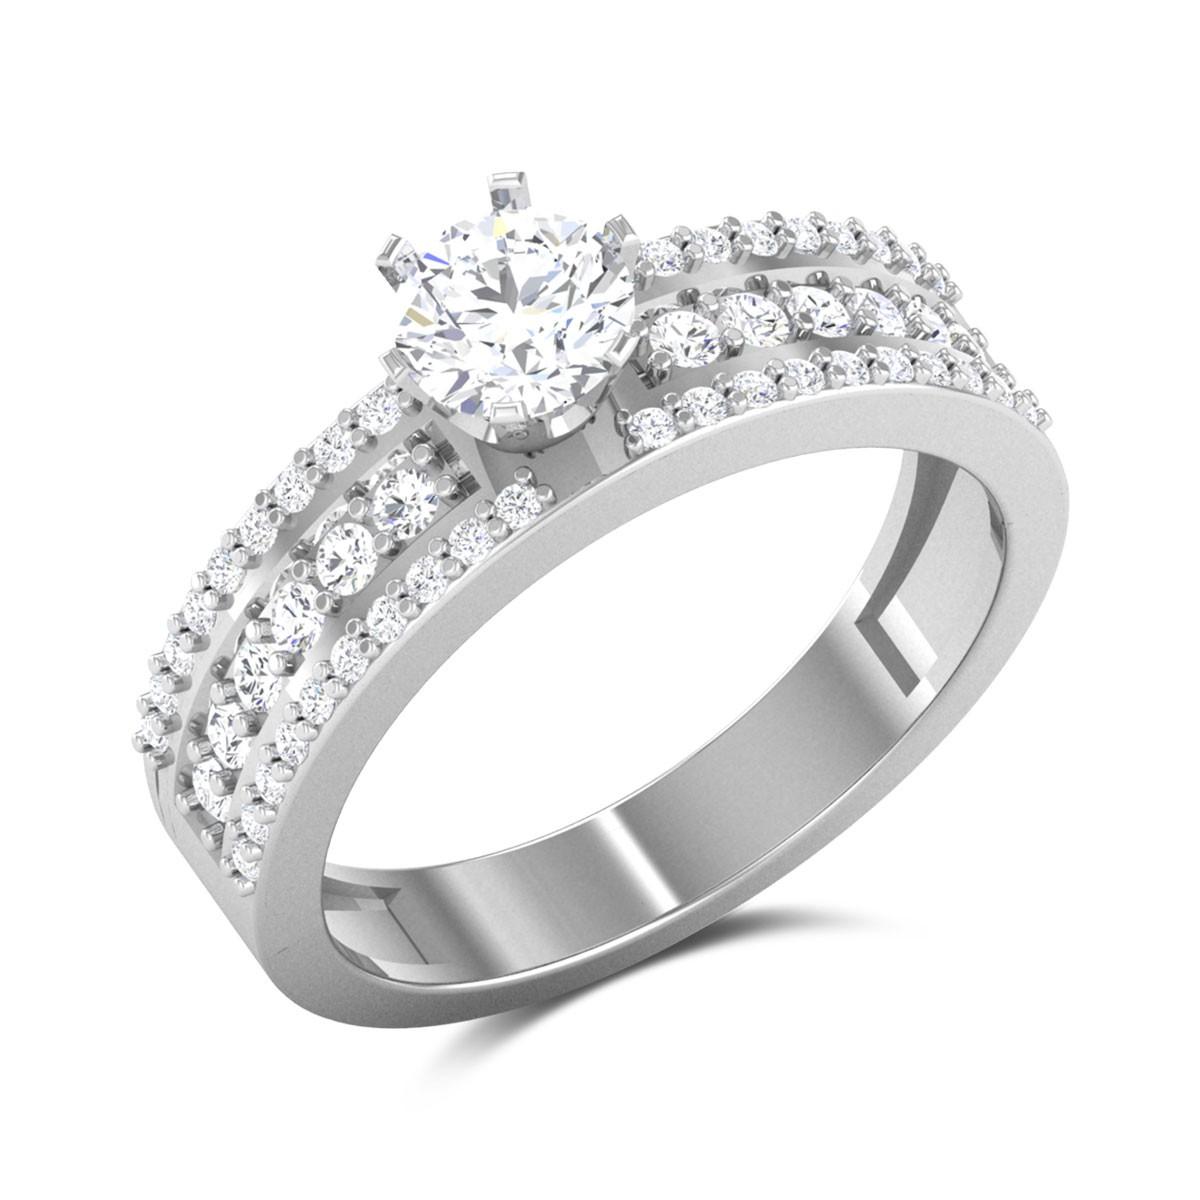 Ilene Royal 6 Prong Solitaire Ring